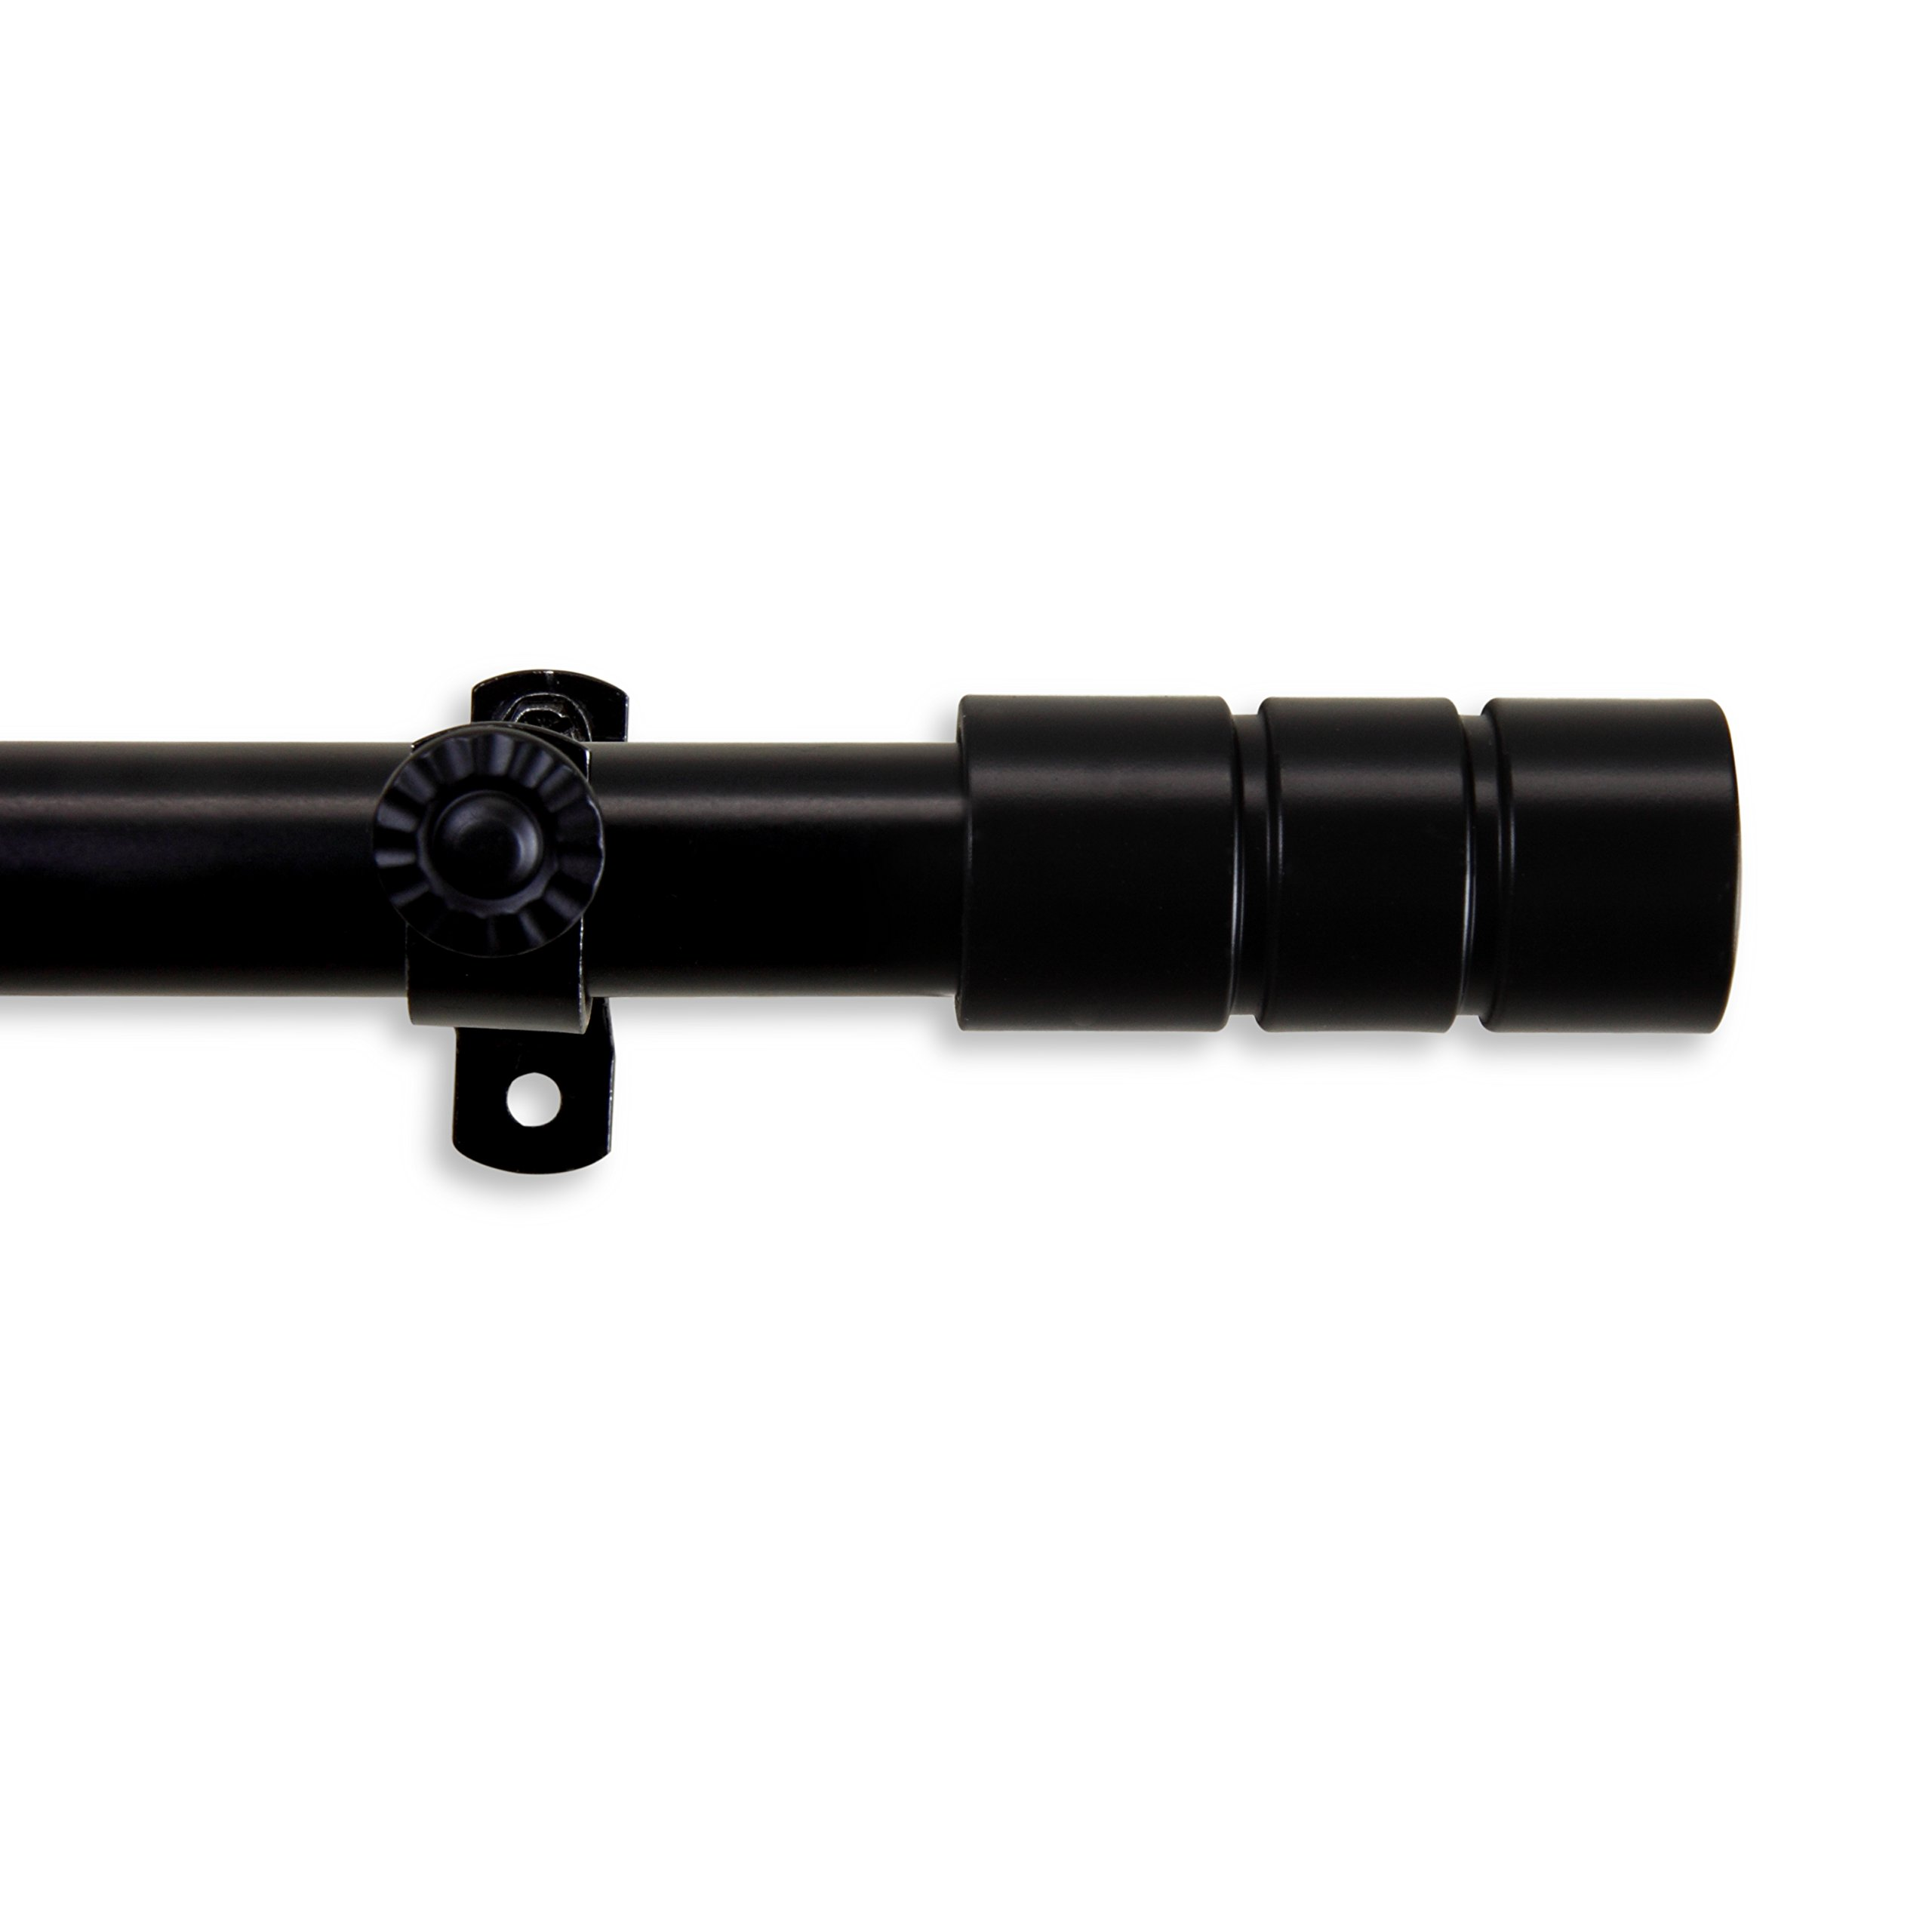 Theo Curtain Rod 28-48 inch - Black